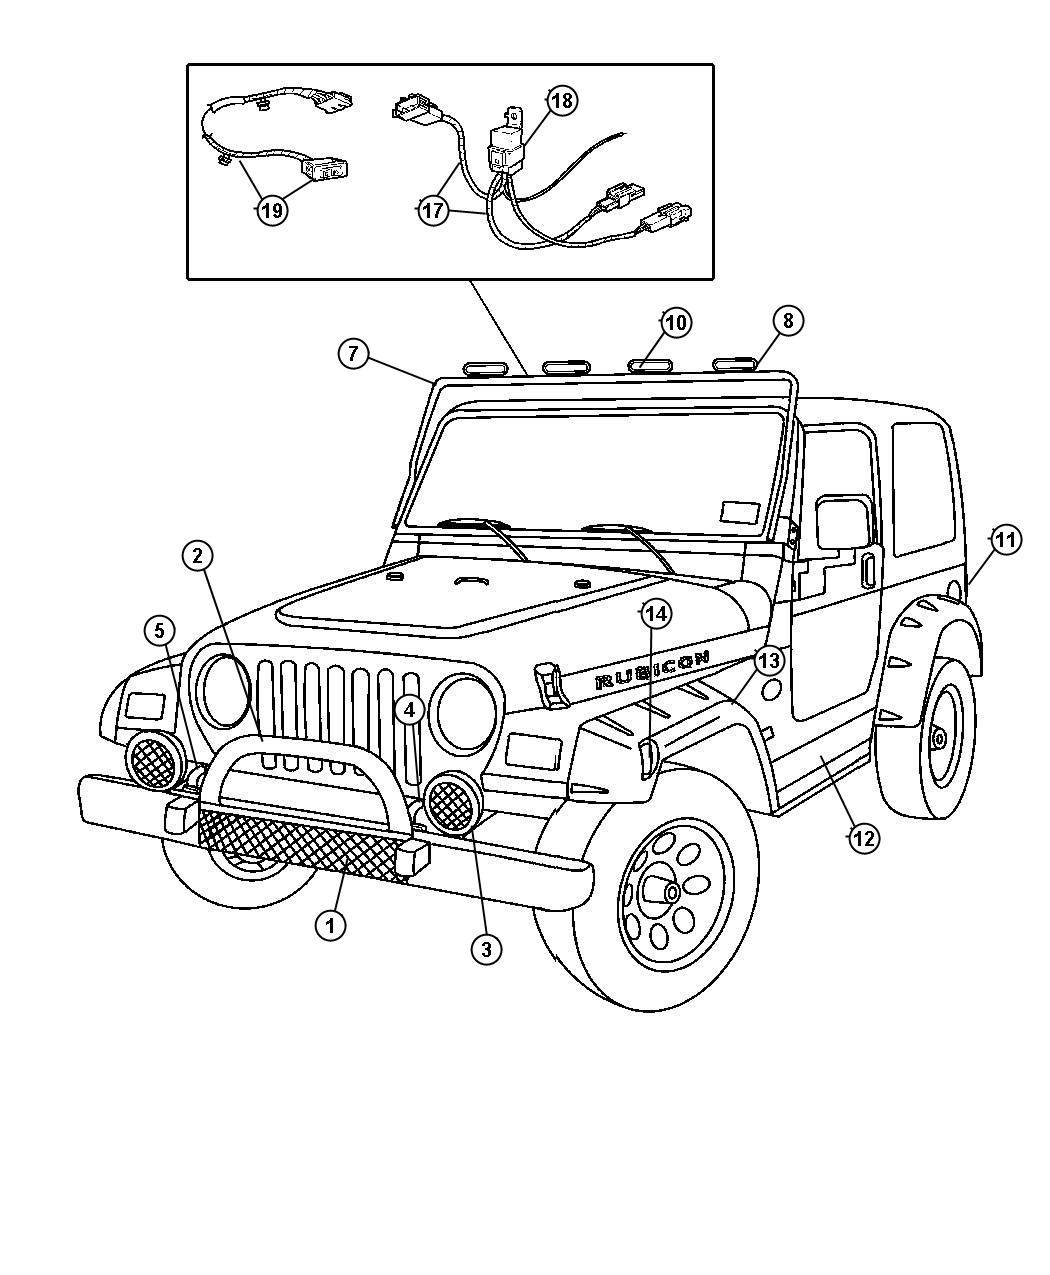 2003 Jeep Wrangler Black mesh-style lens cover for Round